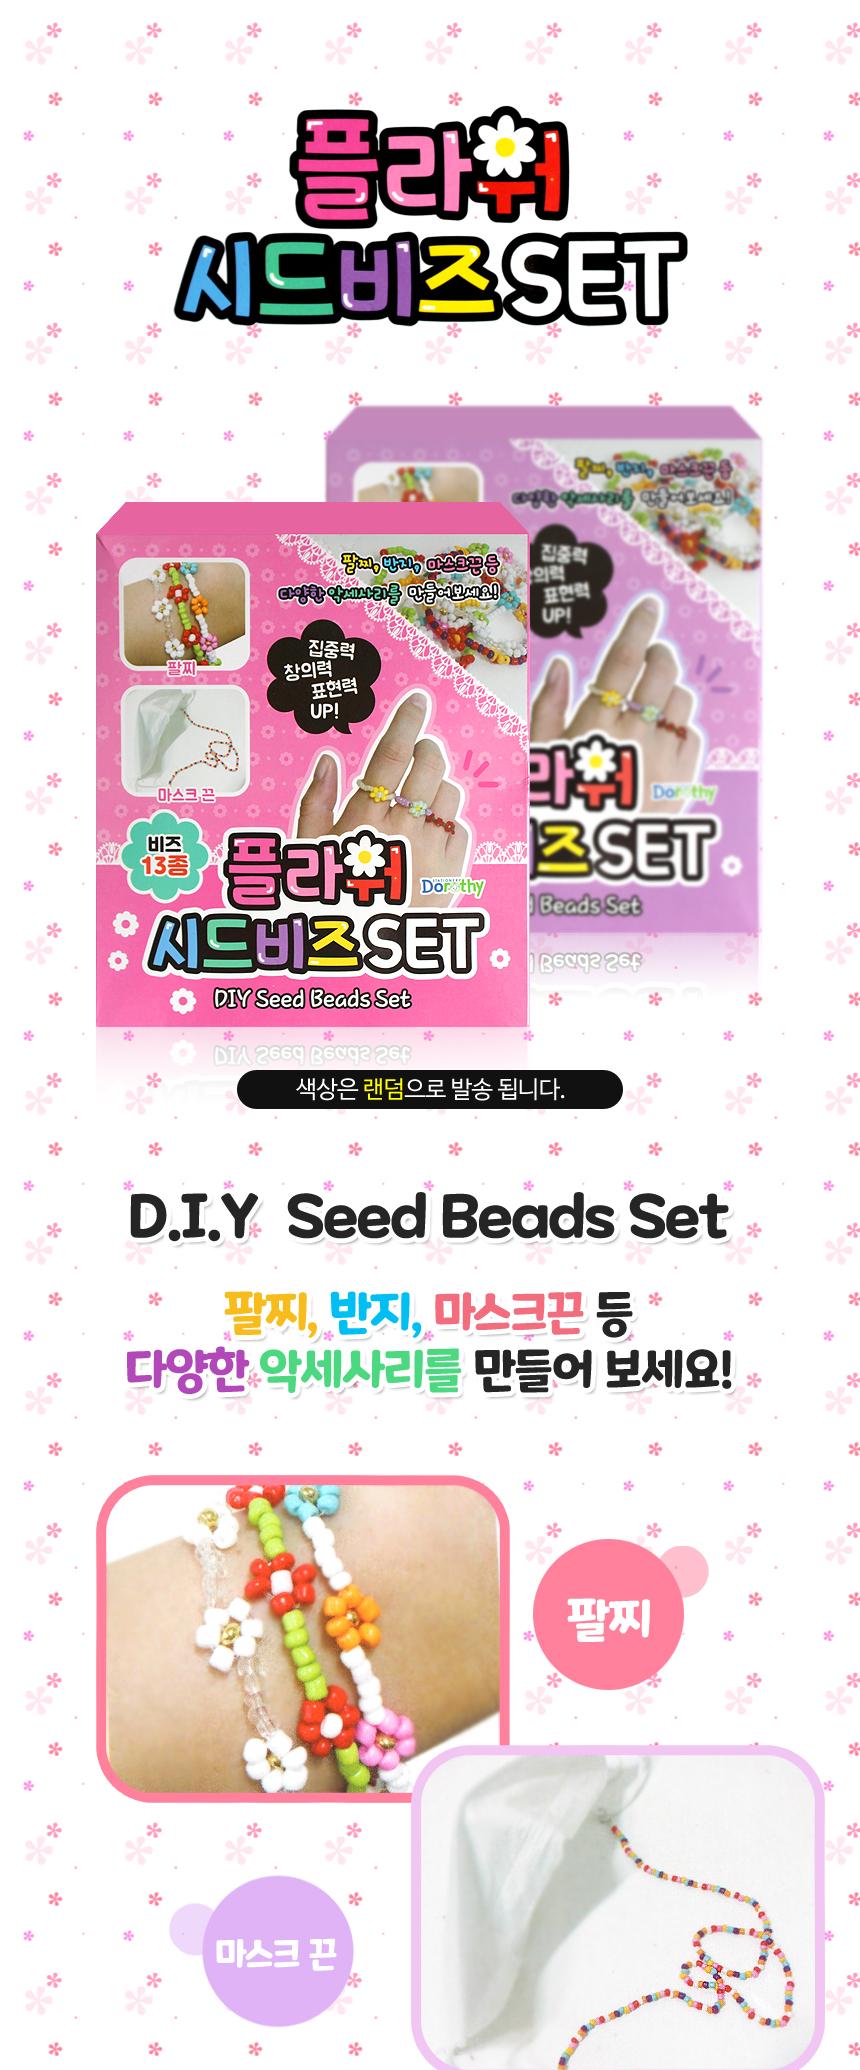 seed_beads_01.jpg